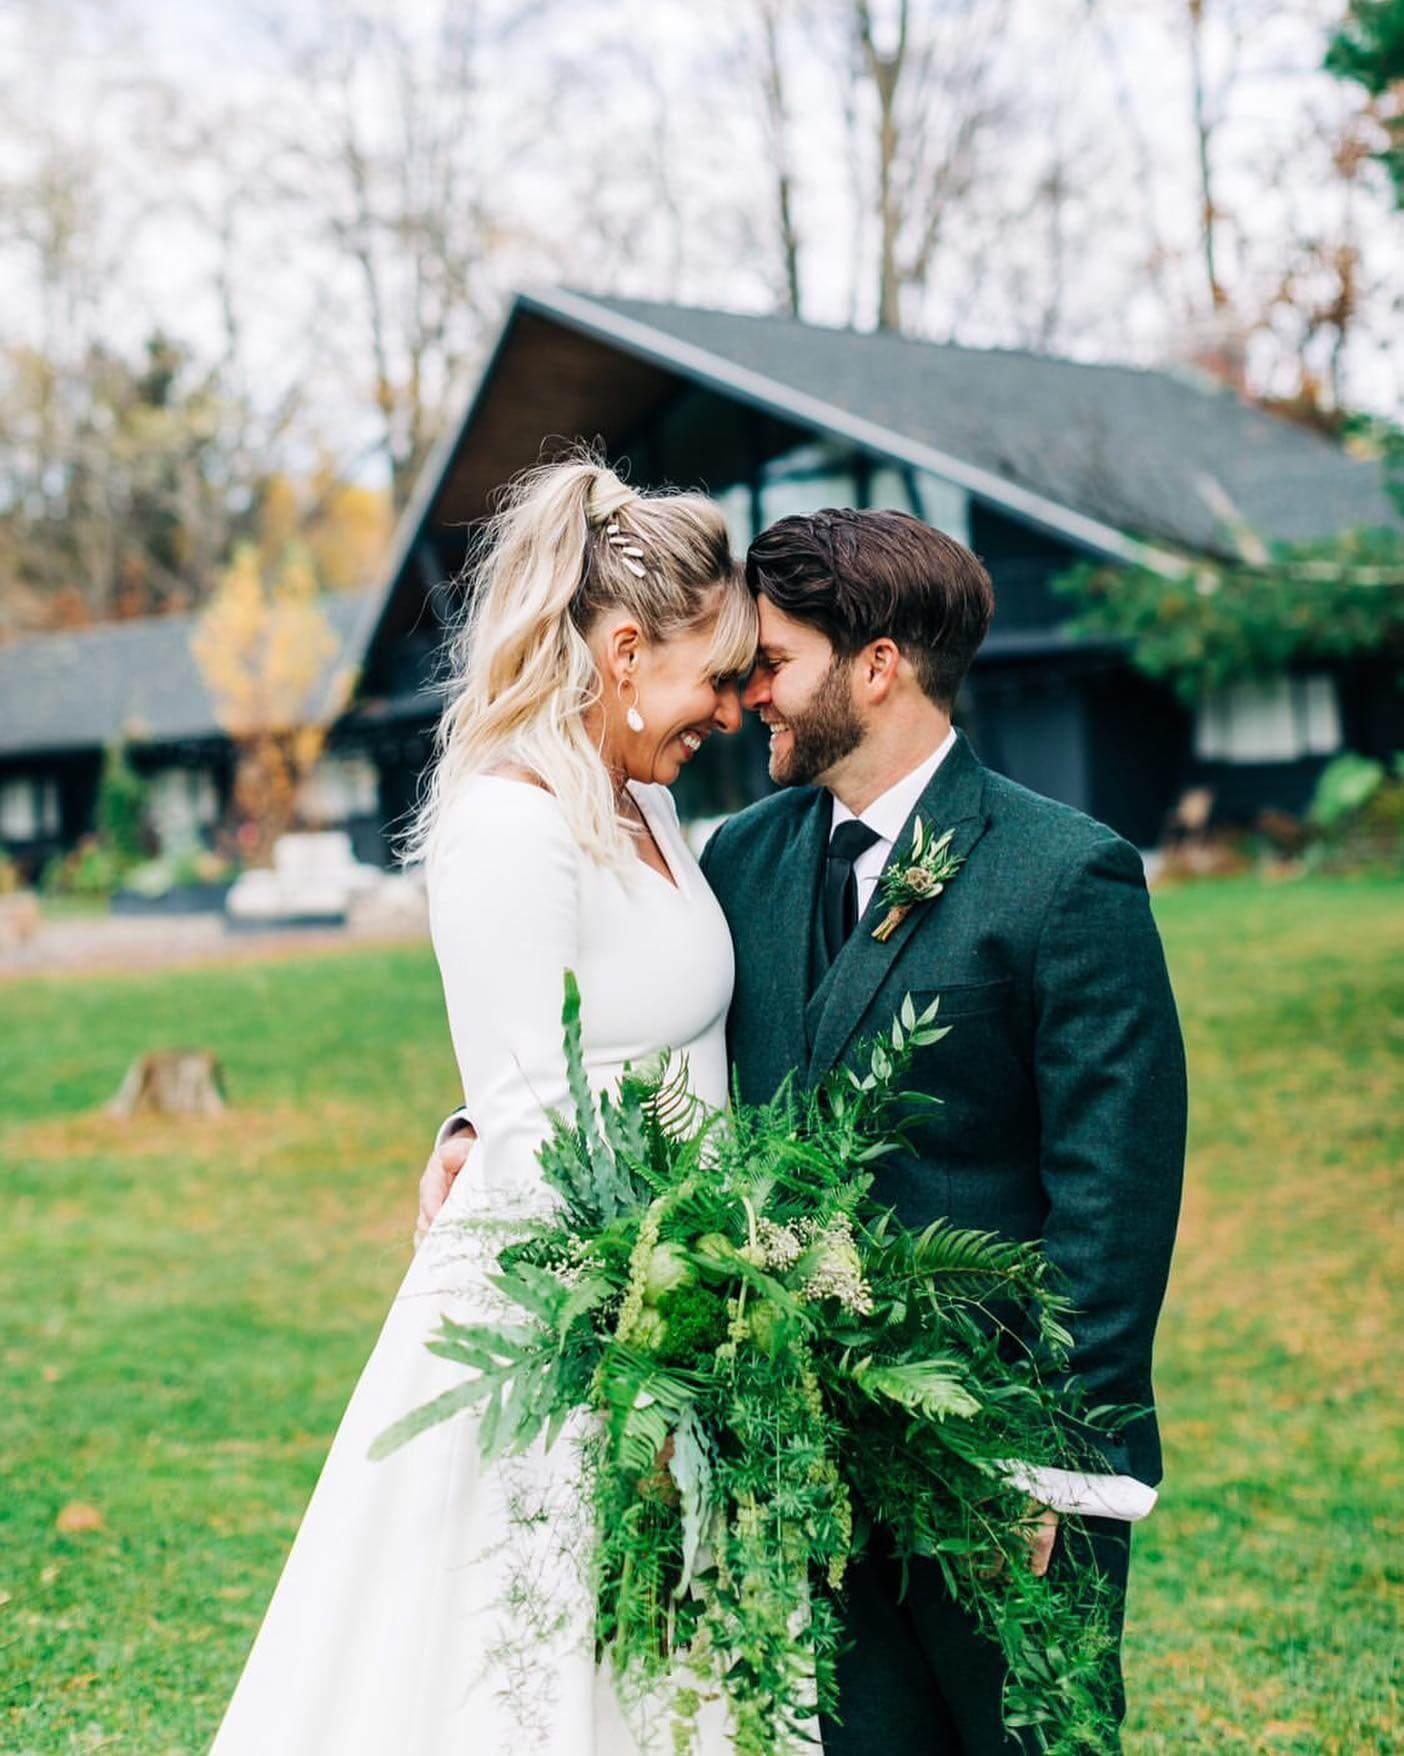 550-elan flowers nyc wedding florist